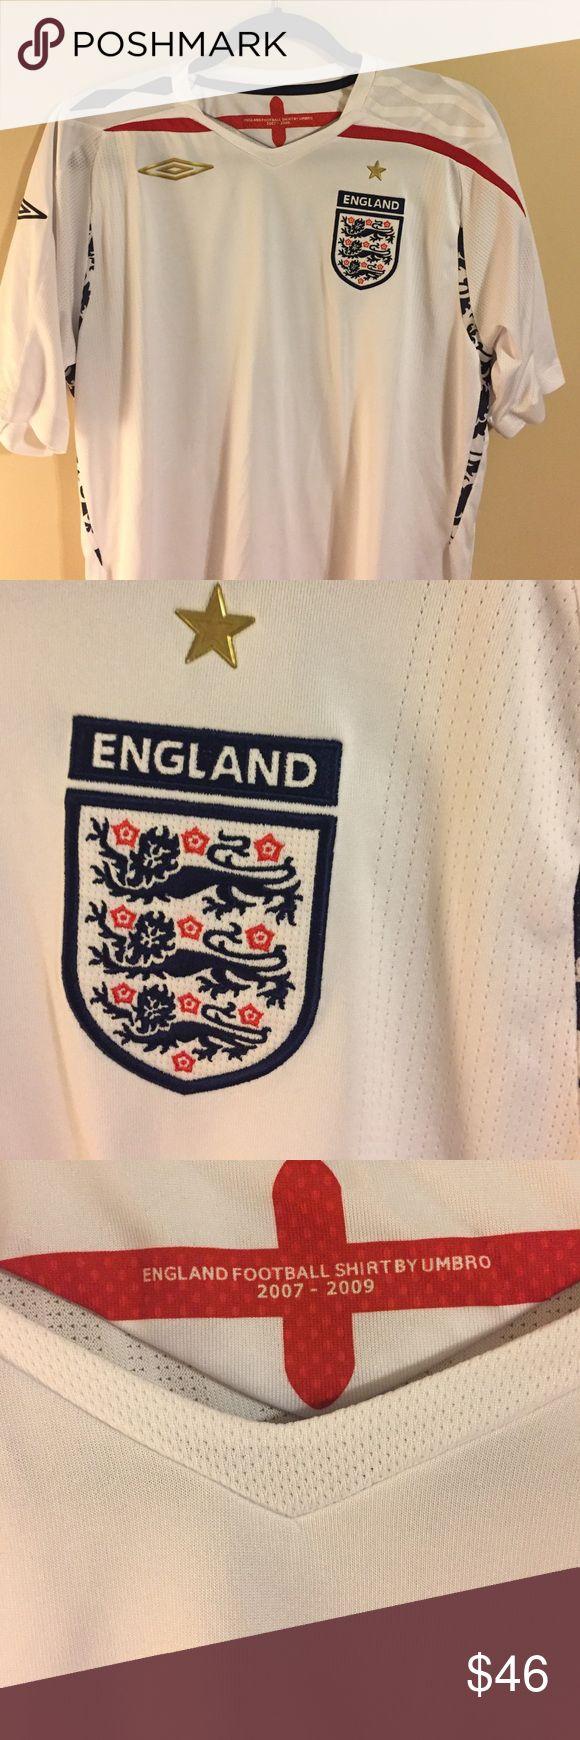 Umbro England Jersey 2007-2009 Worn a few times purchased while in England 2007 Umbro England futbol jersey!! Umbro Shirts Tees - Short Sleeve